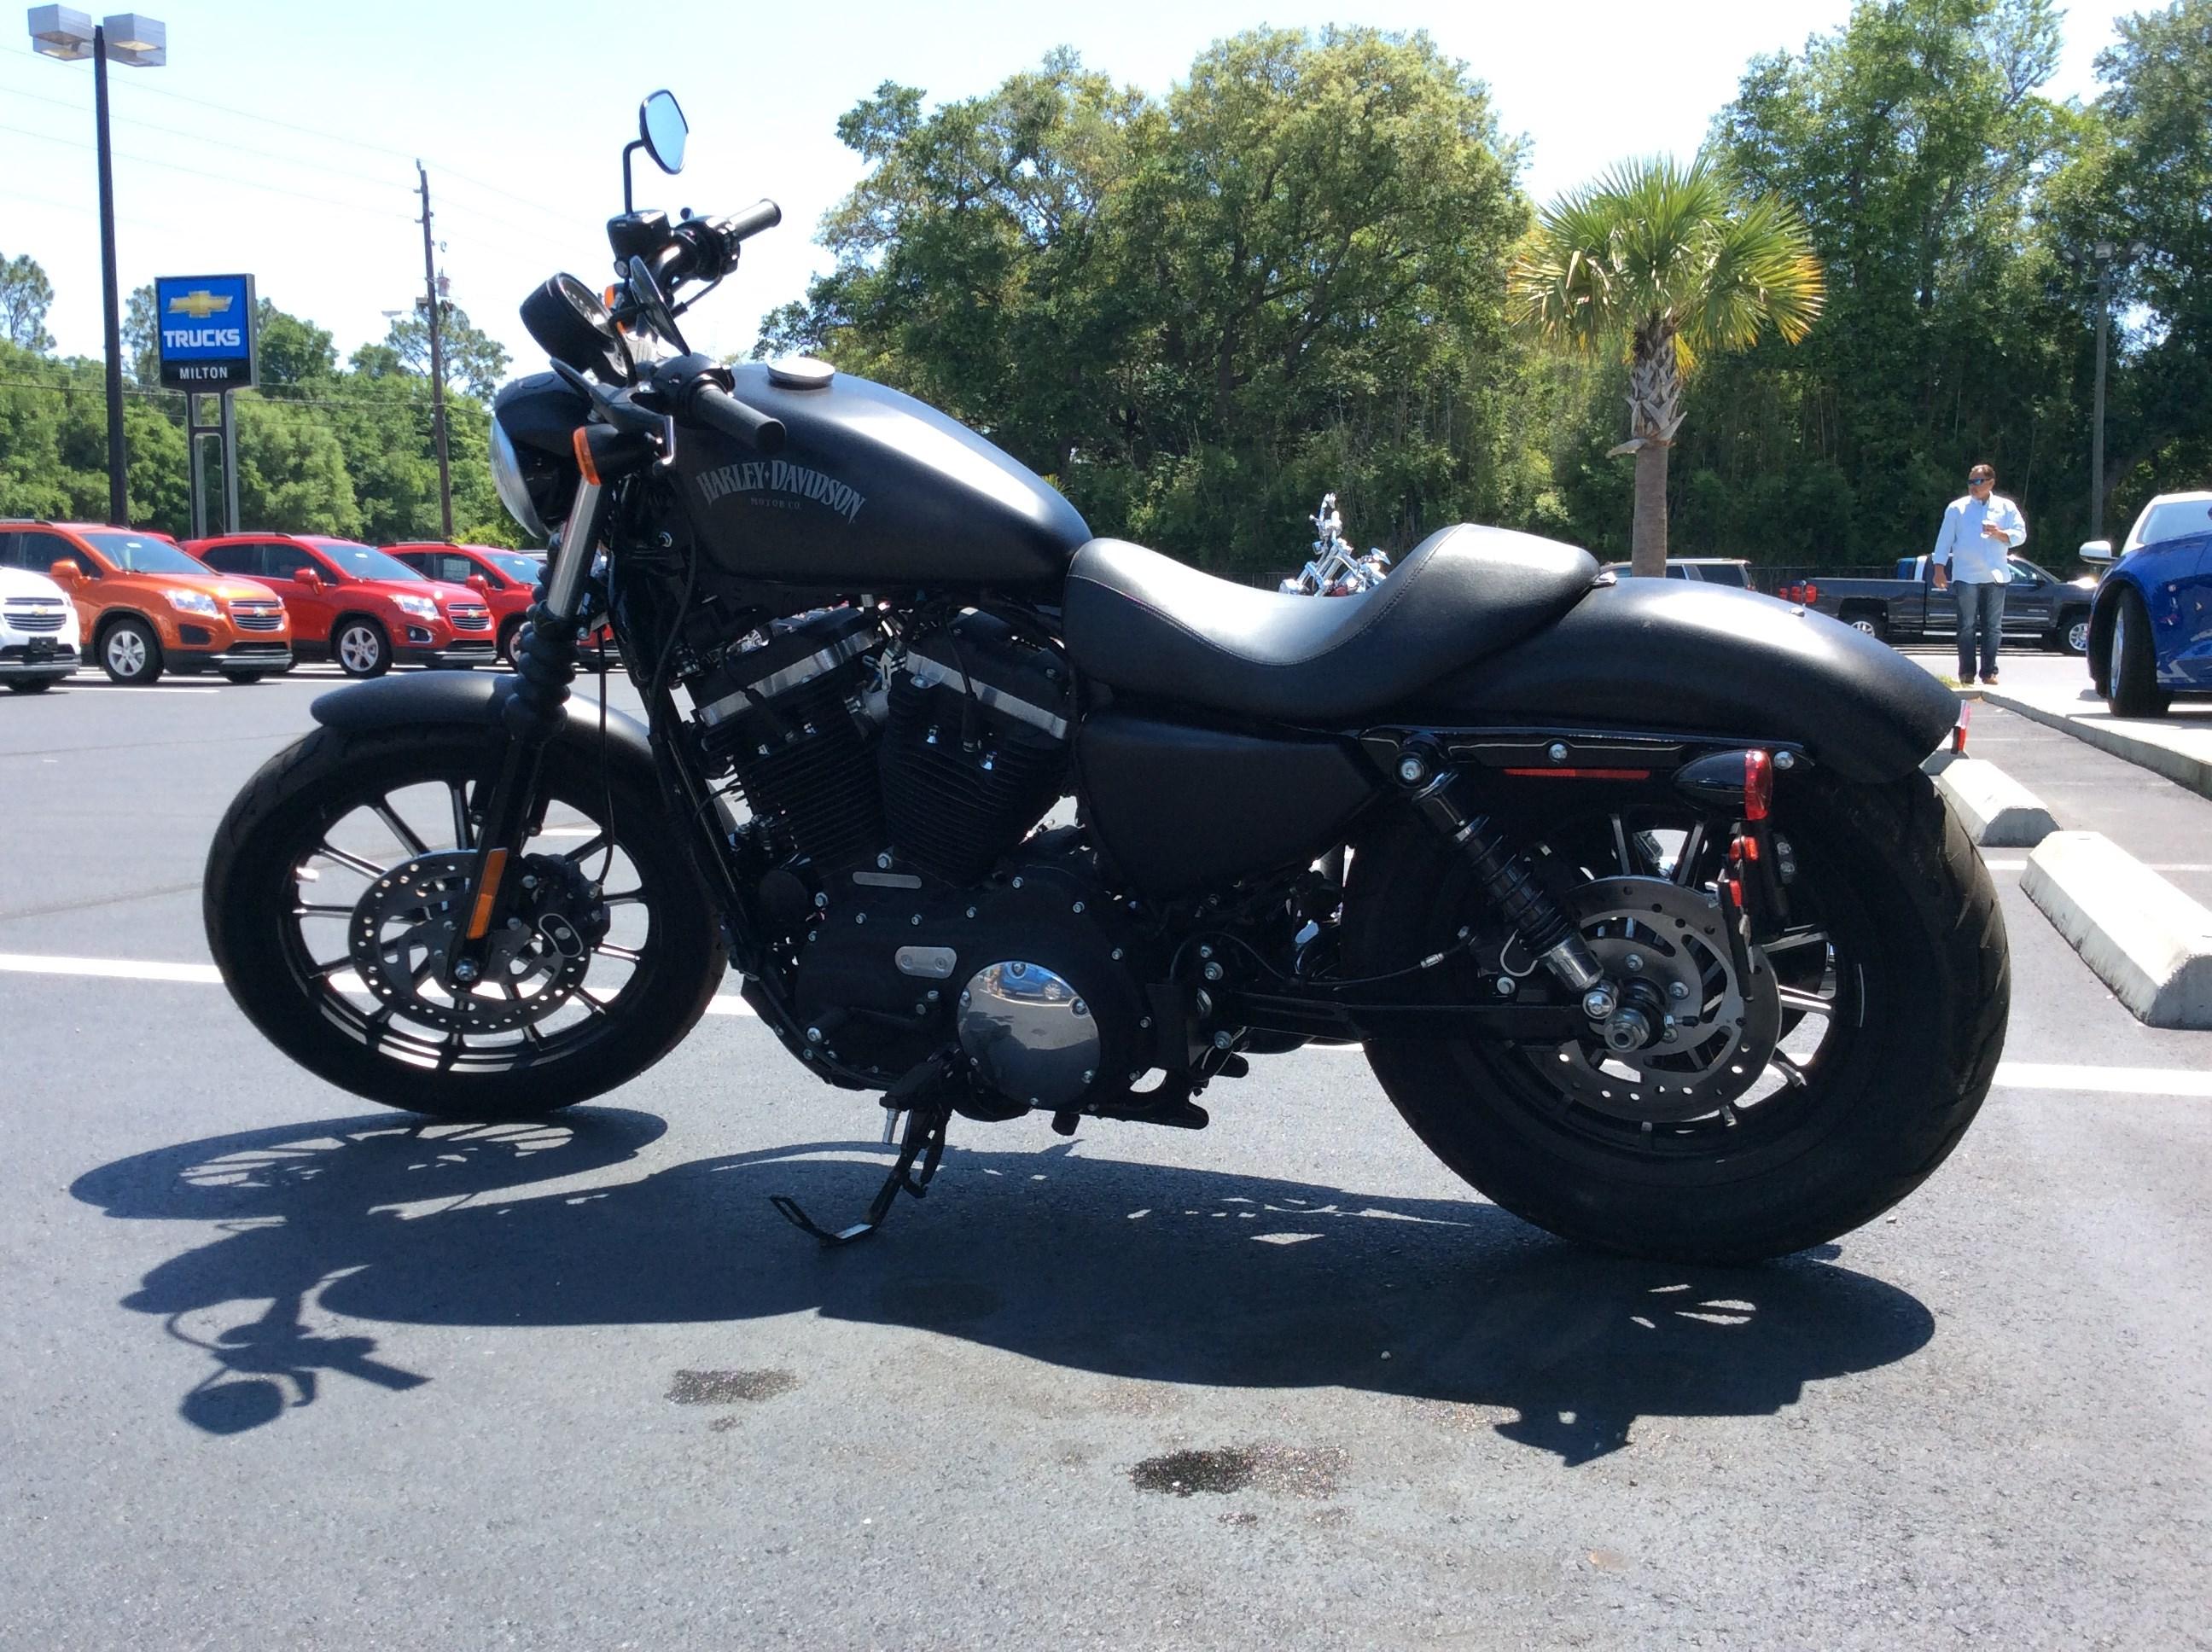 Sportster Motorcycles For Sale Columbus Ga >> 2015 Harley-Davidson® XL883L Sportster® SuperLow® (Black), MILTON, Florida (634091 ...